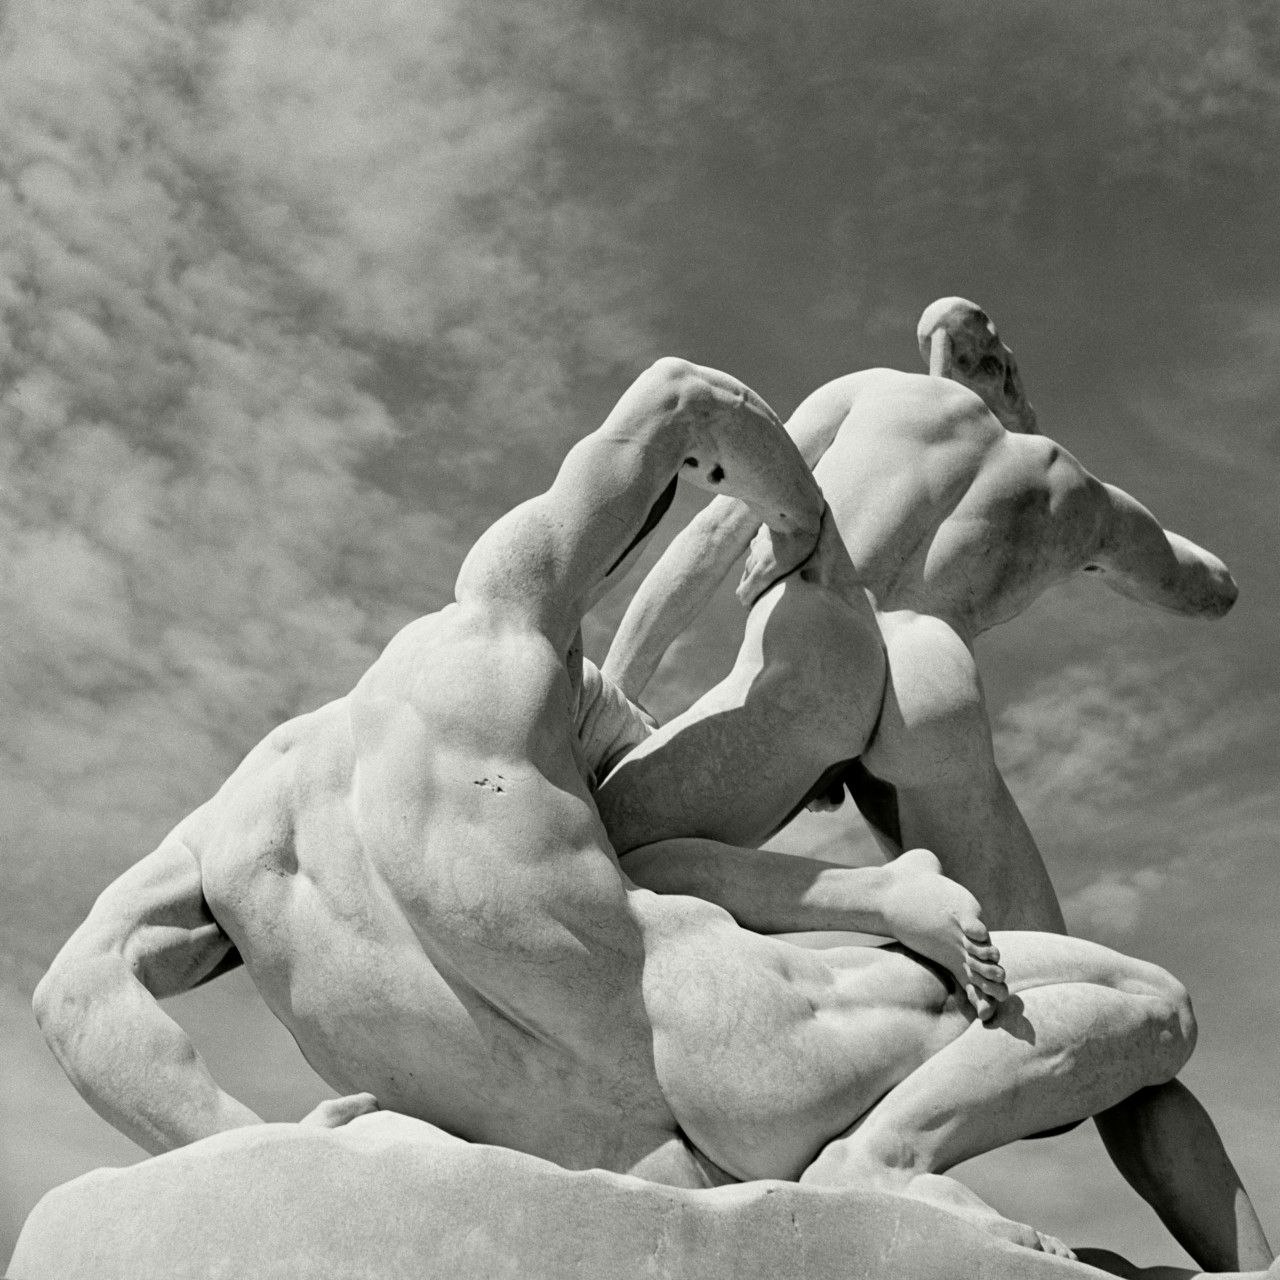 Herbert List The Tuileries gardens. Theseus and the Minotaur. Paris. France. 1936.